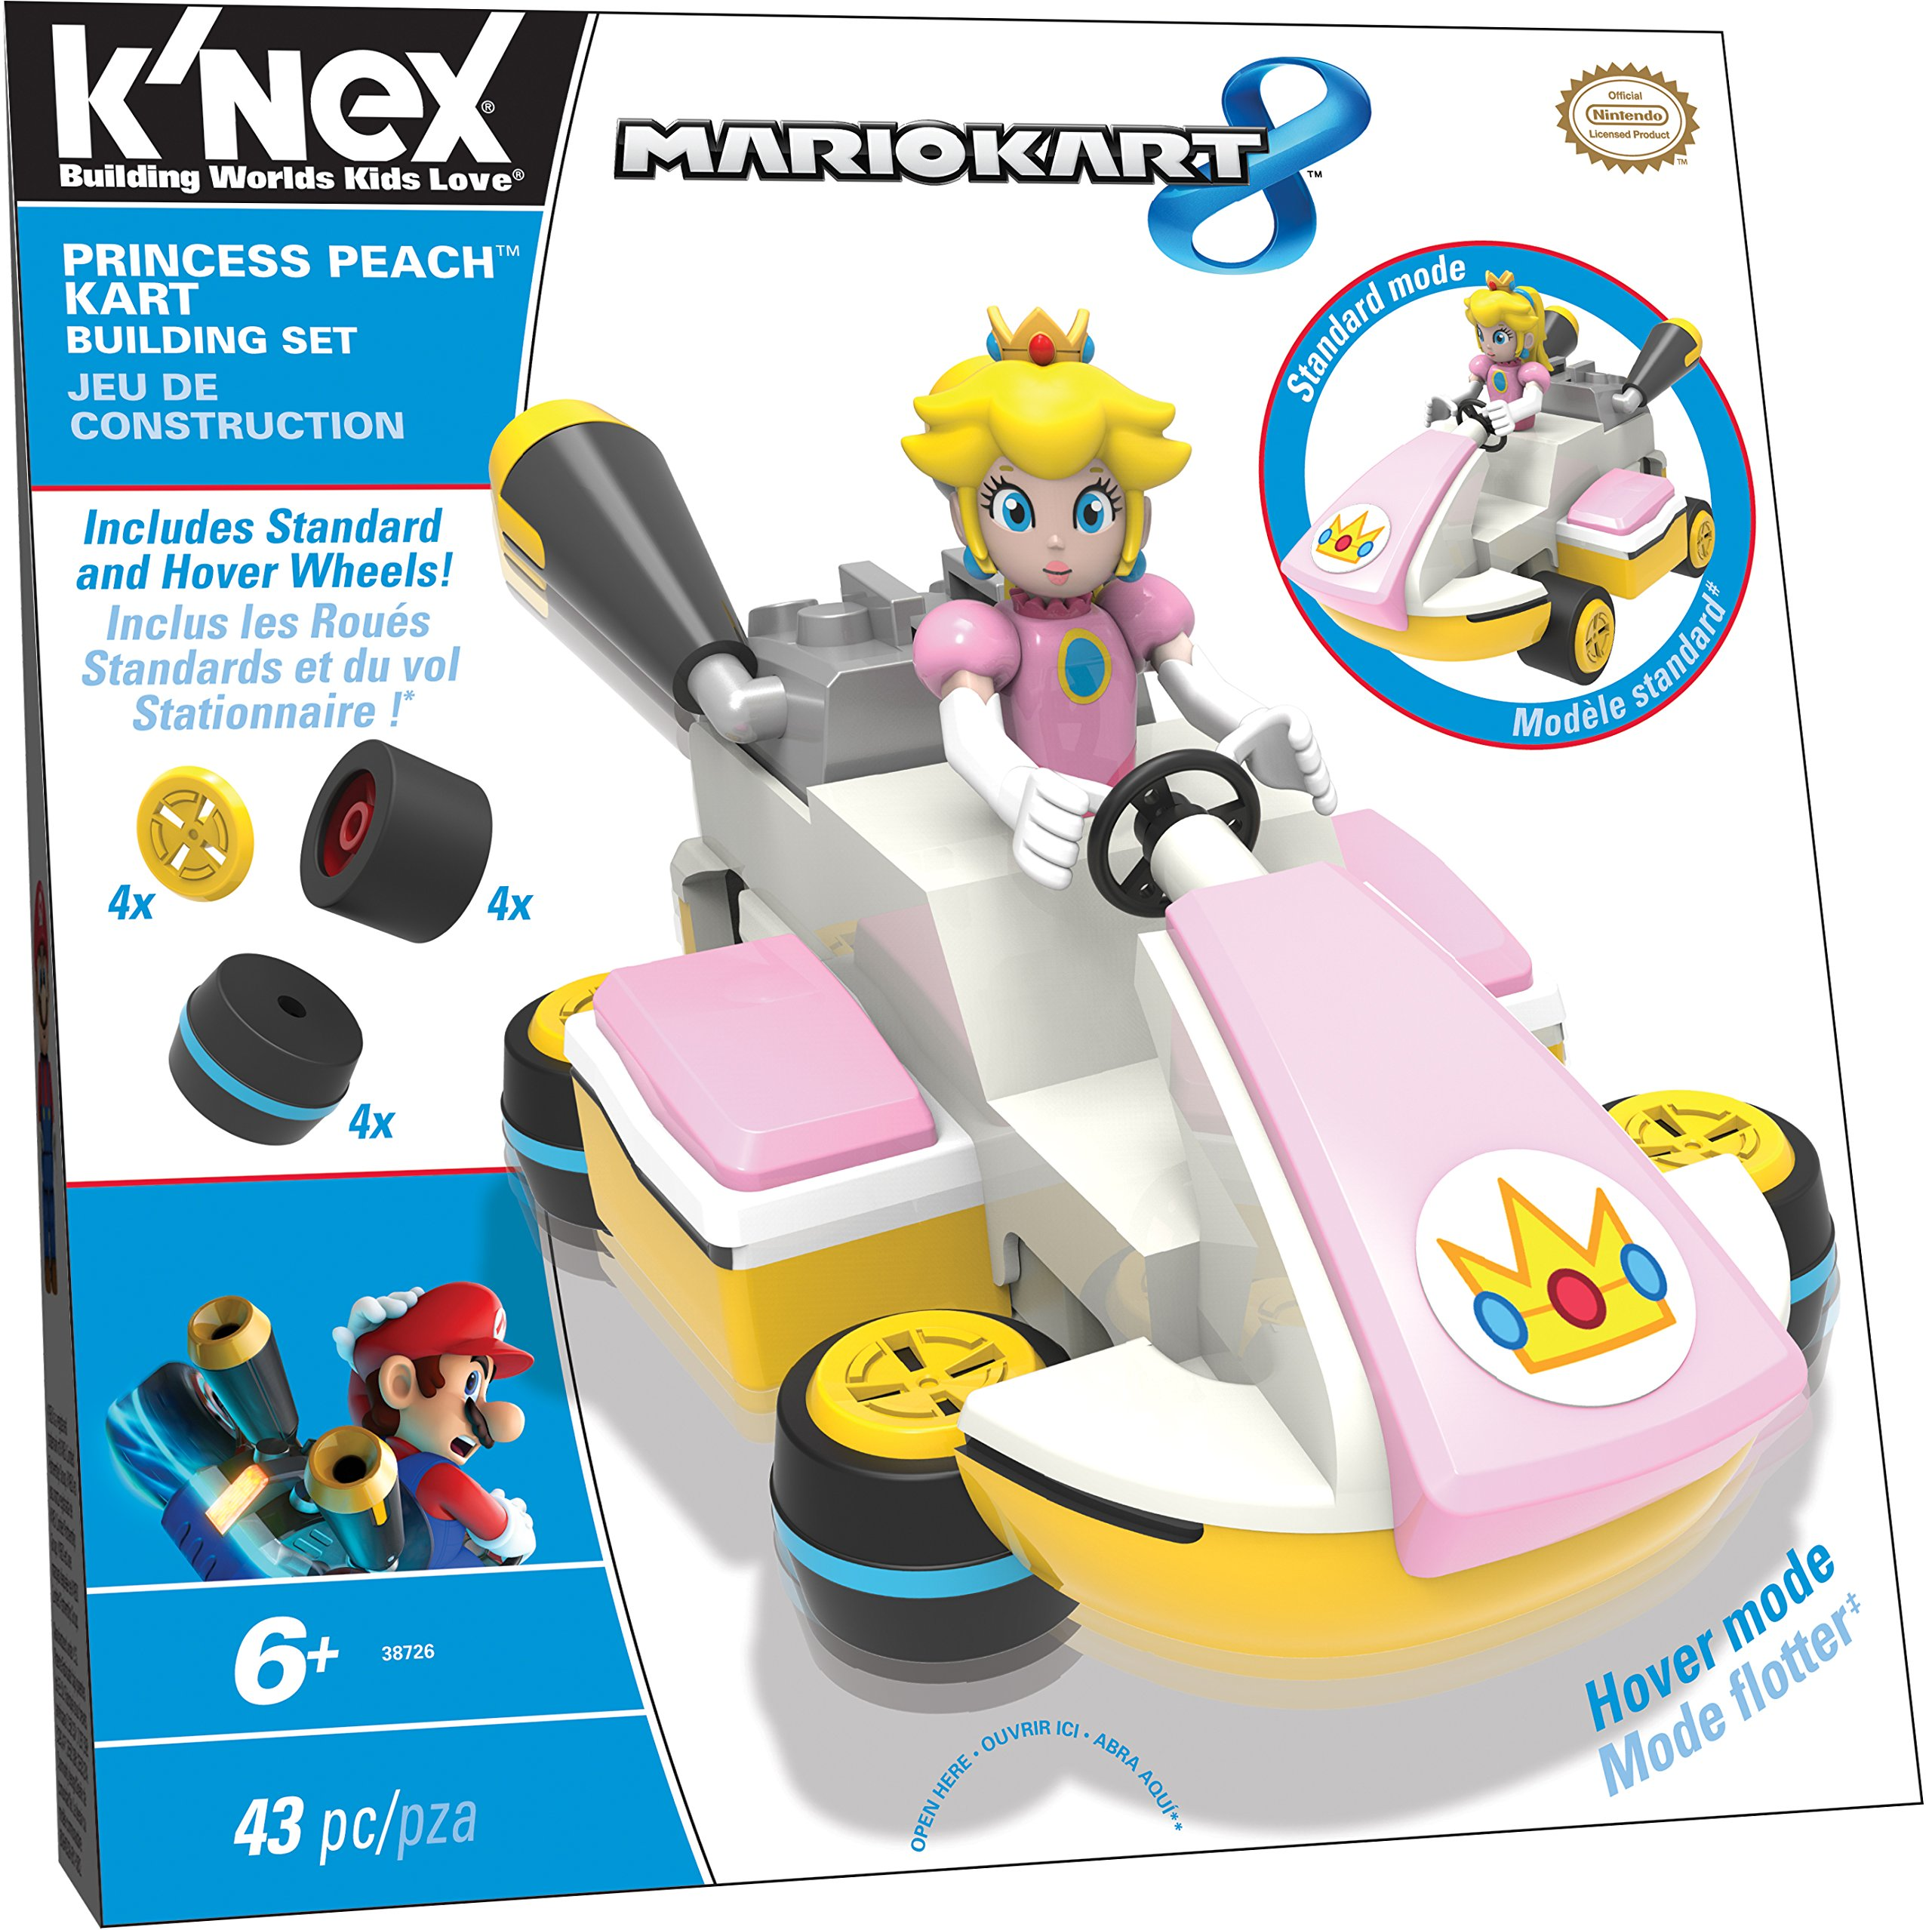 K'NEX Mario Kart 8 - Princess Peach Kart Building Set